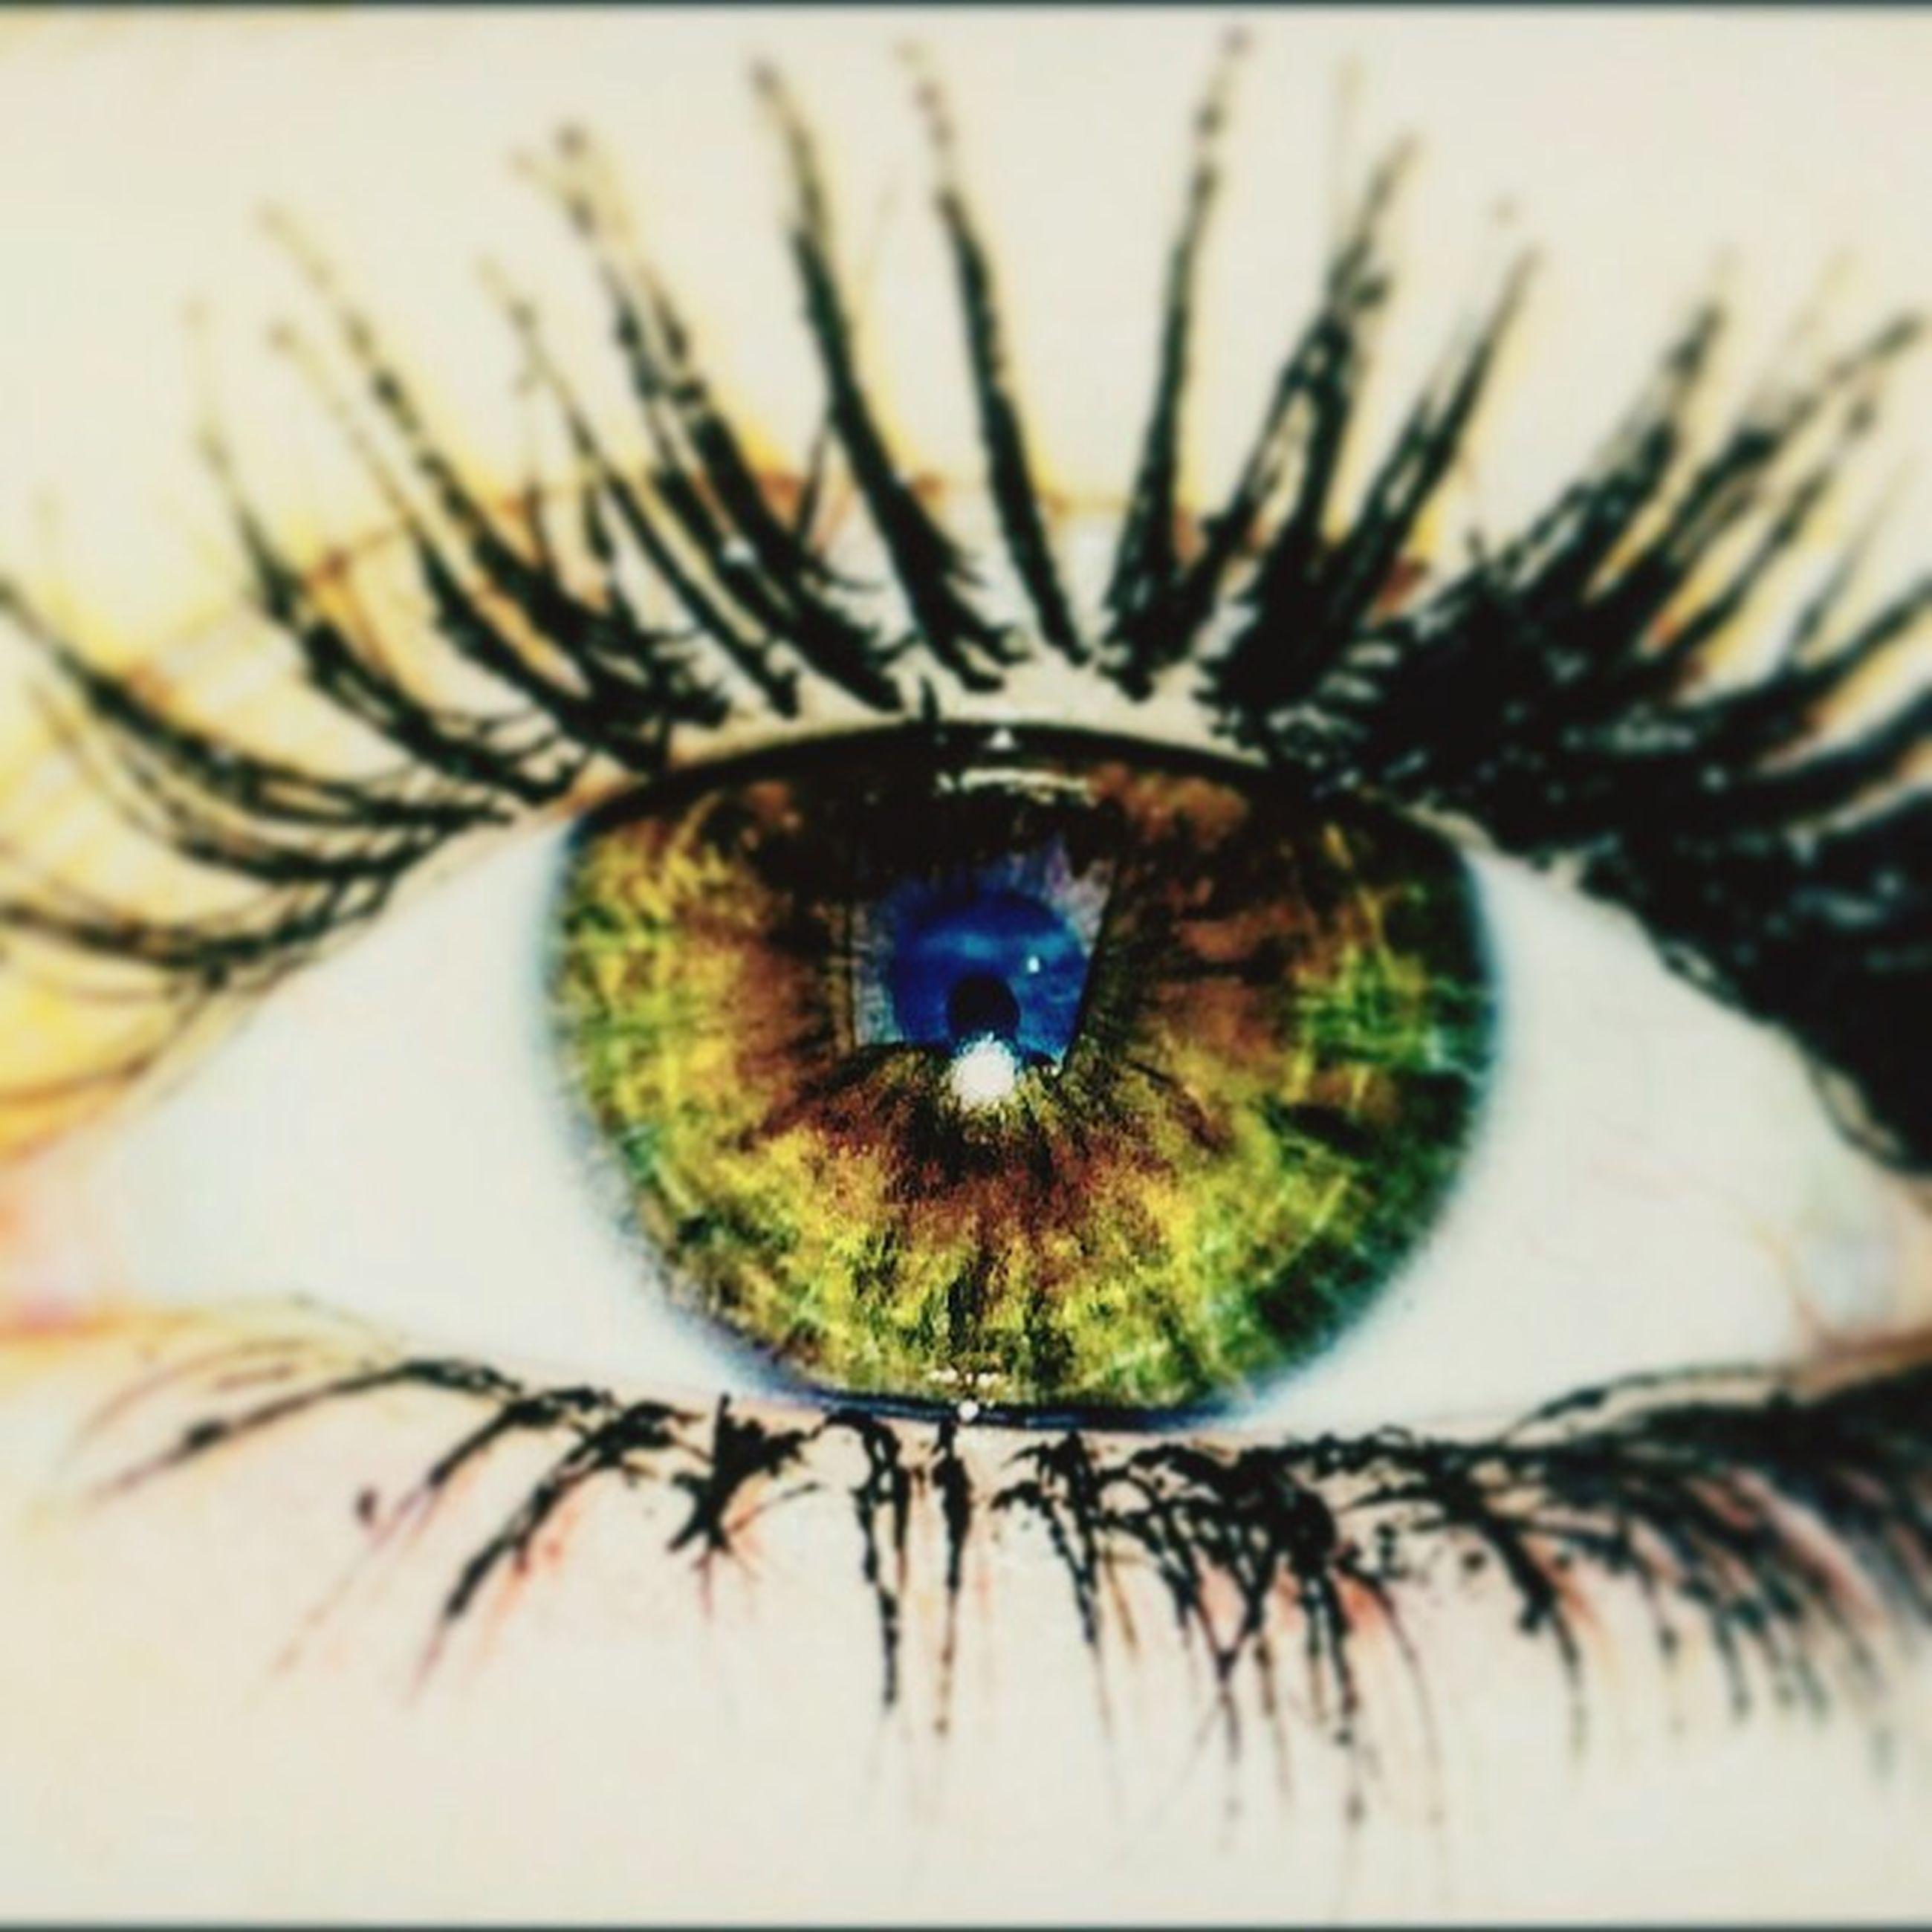 human eye, eyesight, eyelash, close-up, sensory perception, extreme close-up, eyeball, looking at camera, iris - eye, portrait, reflection, extreme close up, full frame, part of, unrecognizable person, circle, detail